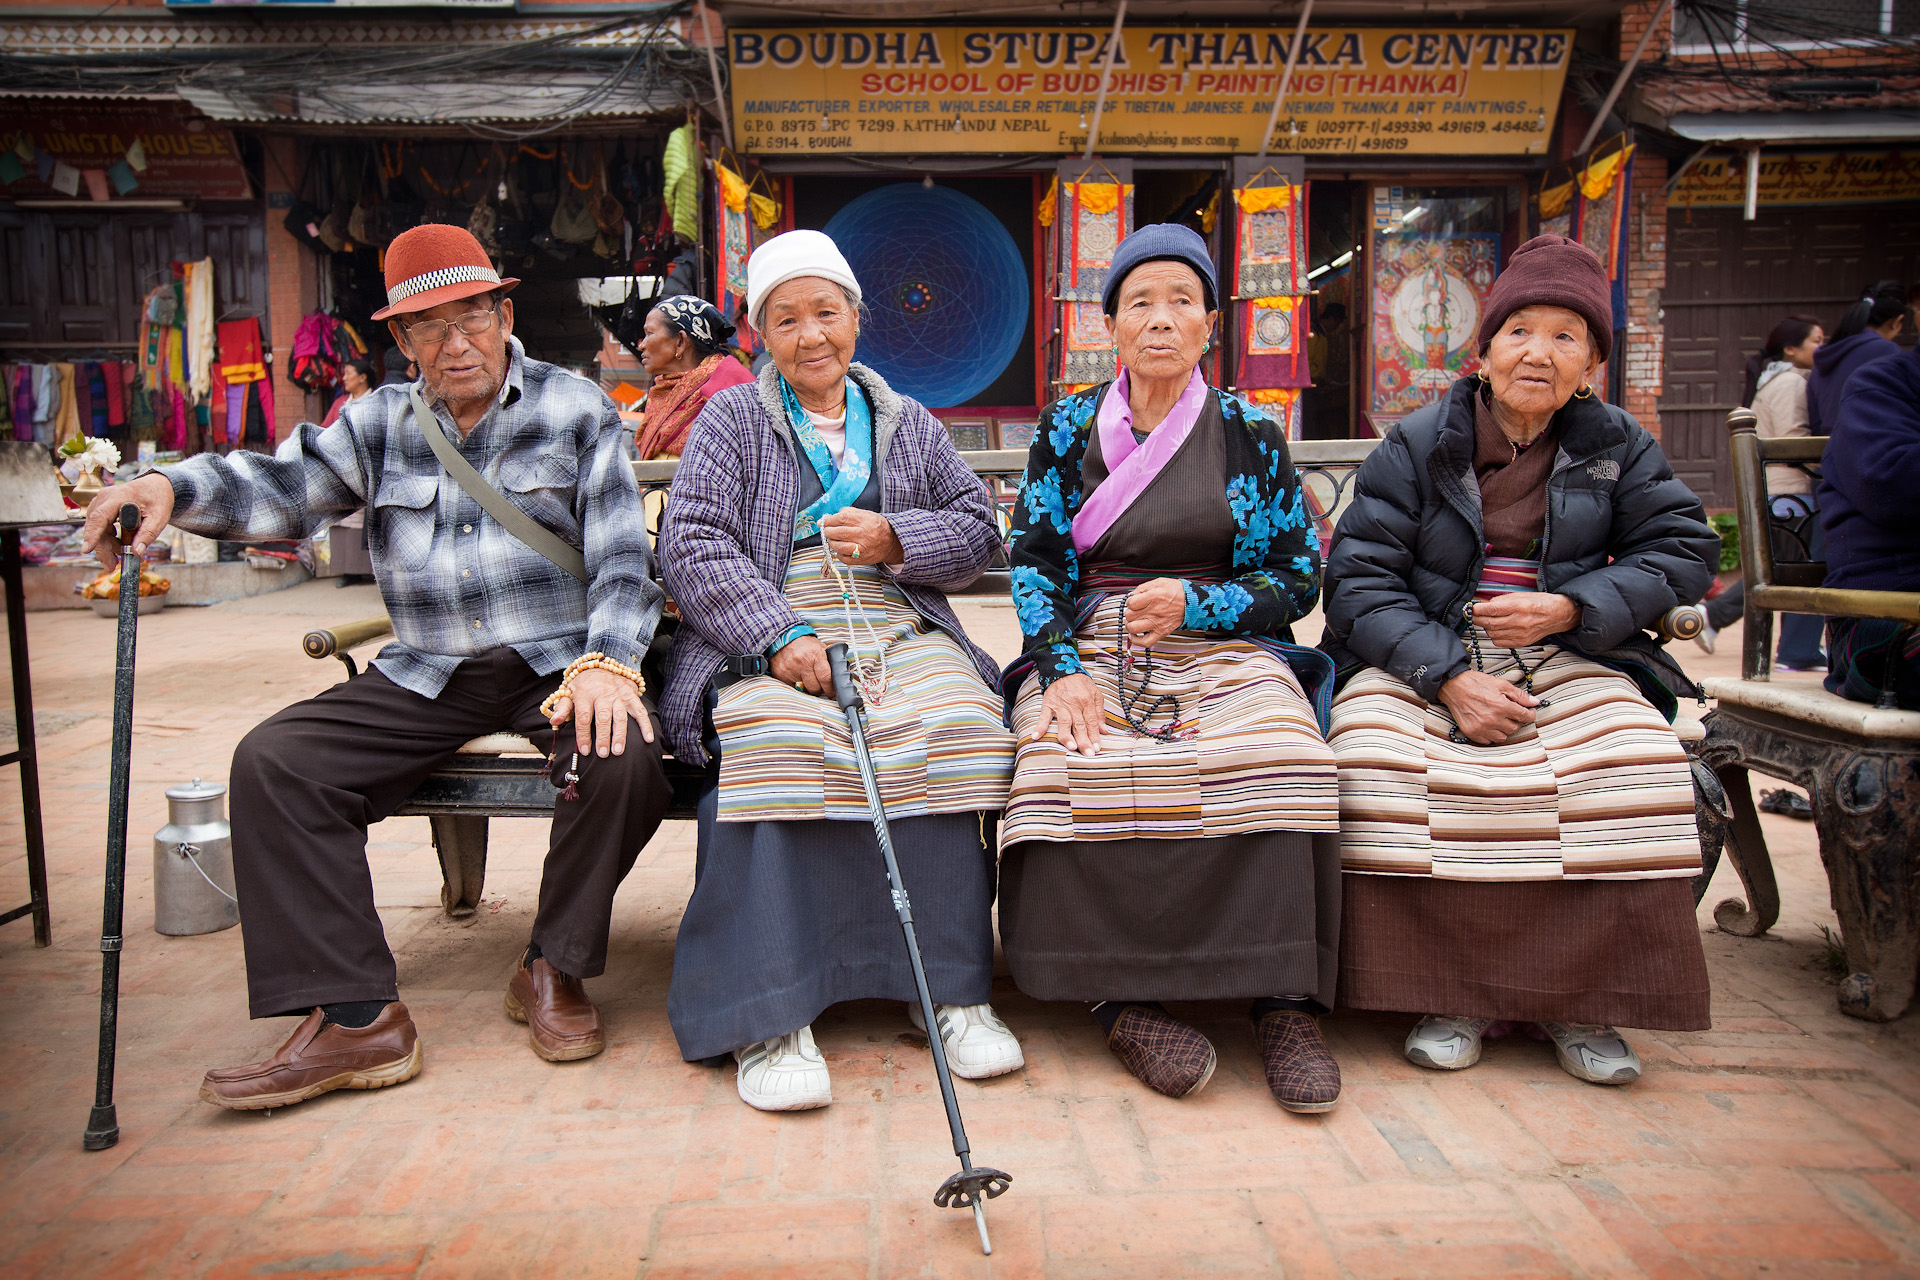 Nepal-Kathmandu-Travel-Boudhanath-Buddhism-Tibetan_1.JPG